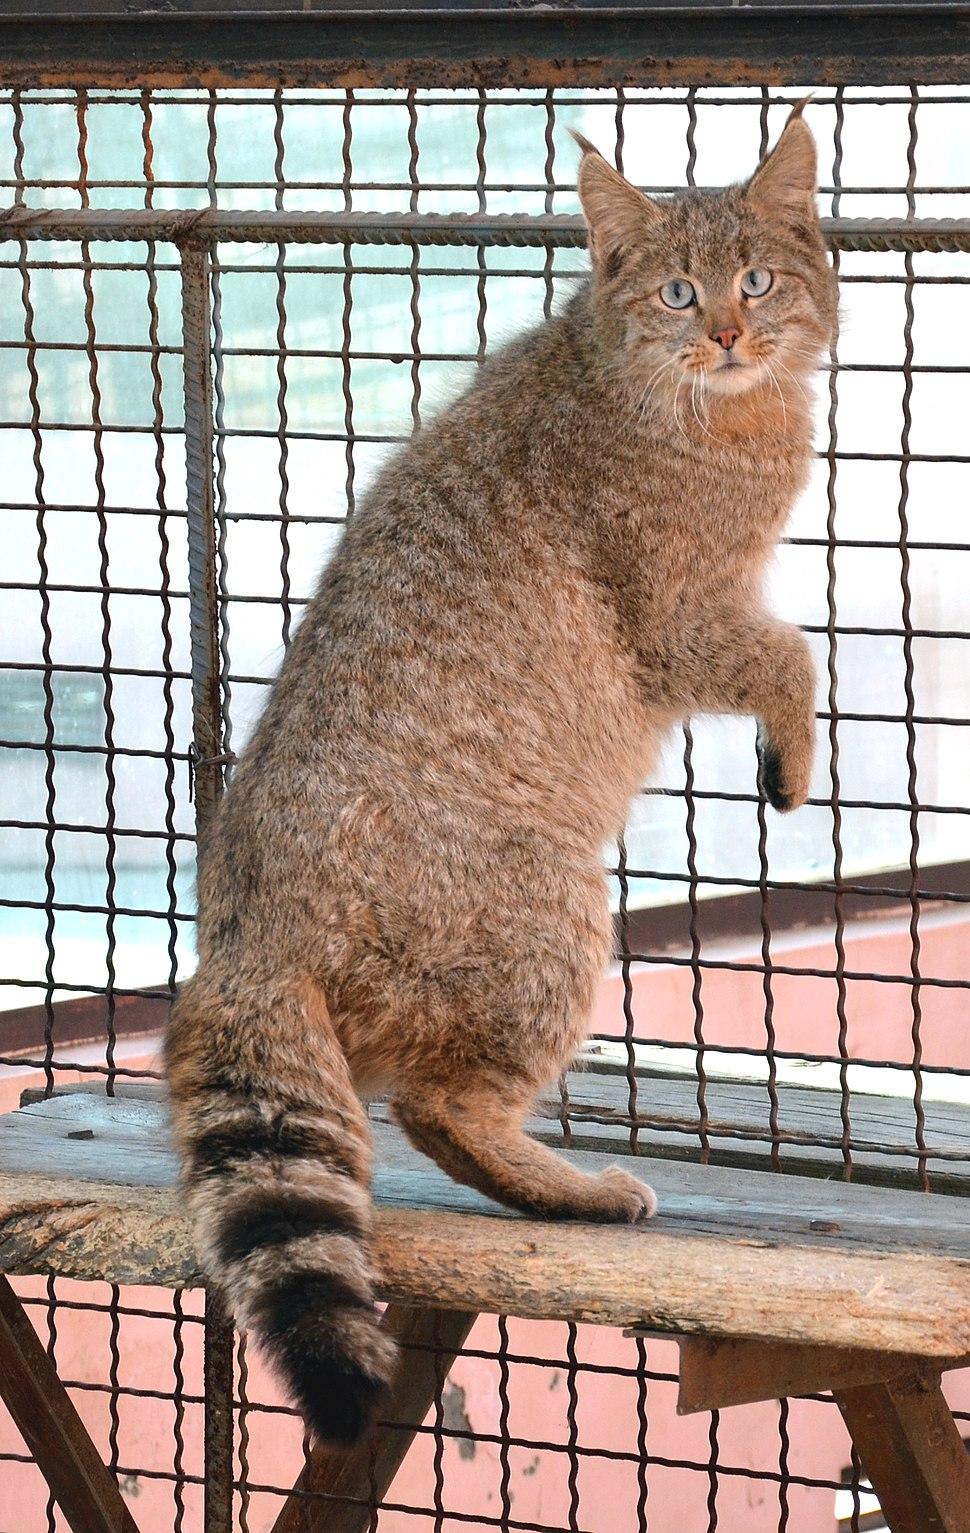 Chinese Mountain Cat (Felis Bieti) in XiNing Wild Zoo